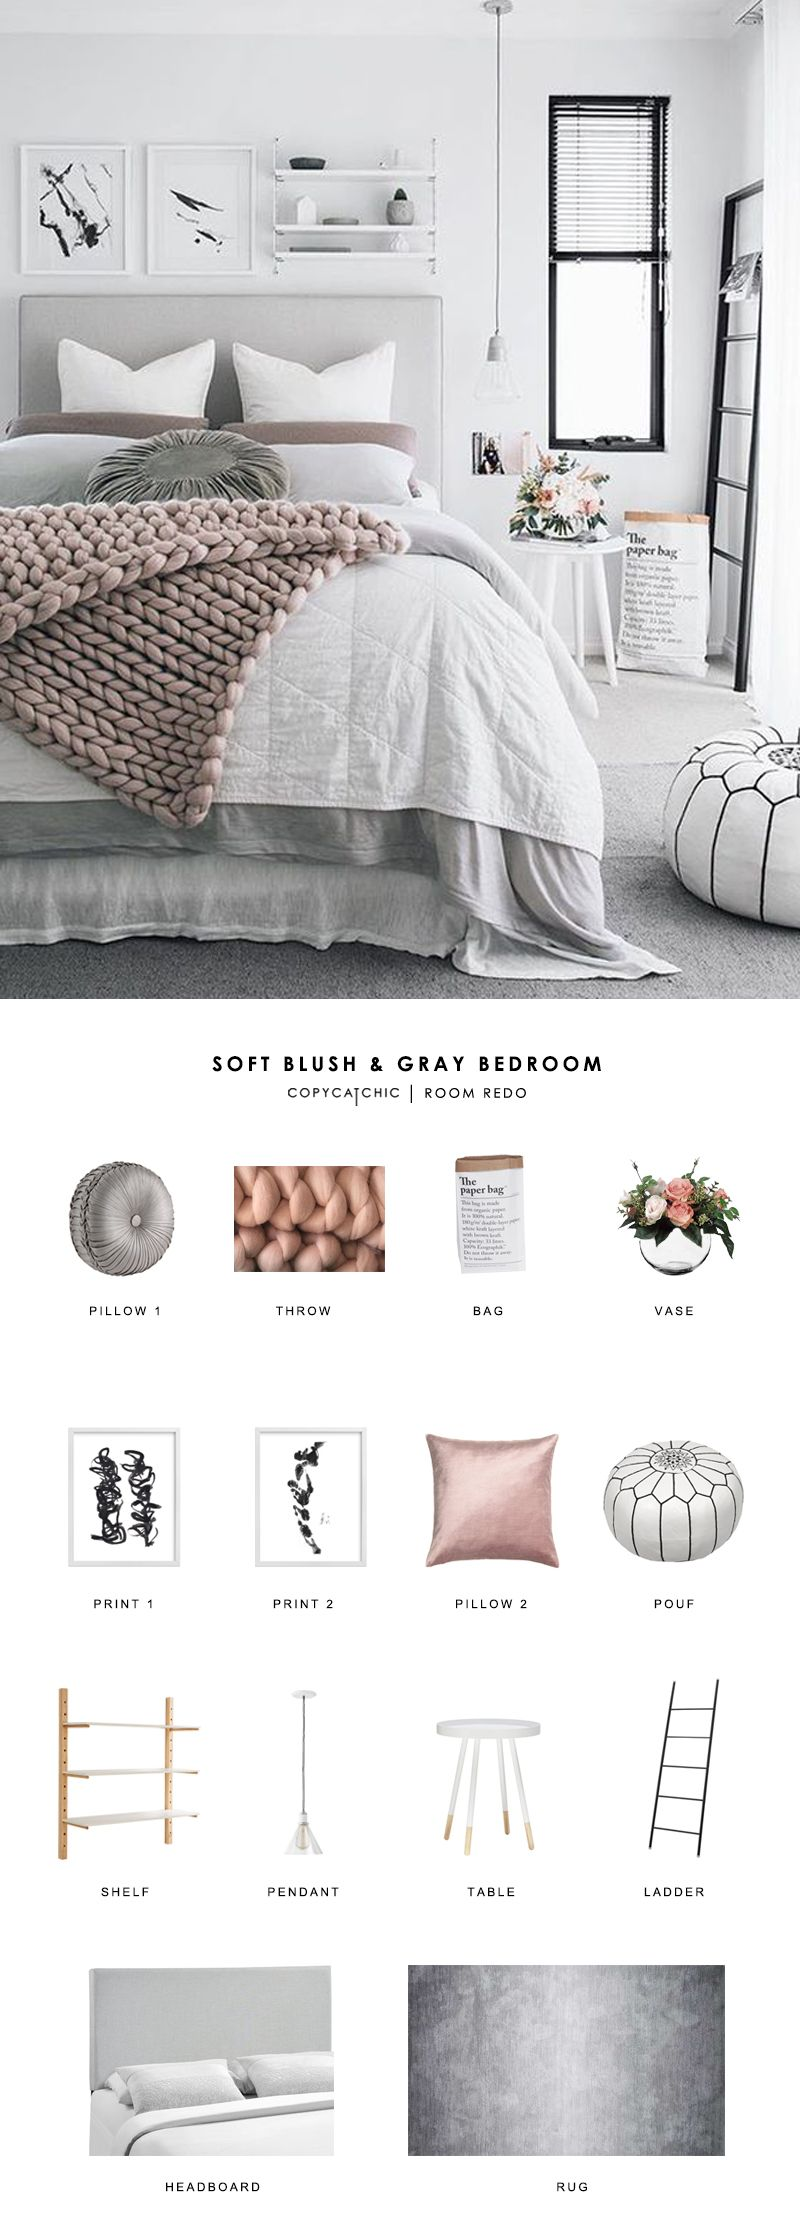 Copy Cat Chic Room Redo | Soft Blush and Gray Bedroom | Copy Cat Chic | Bloglovin'